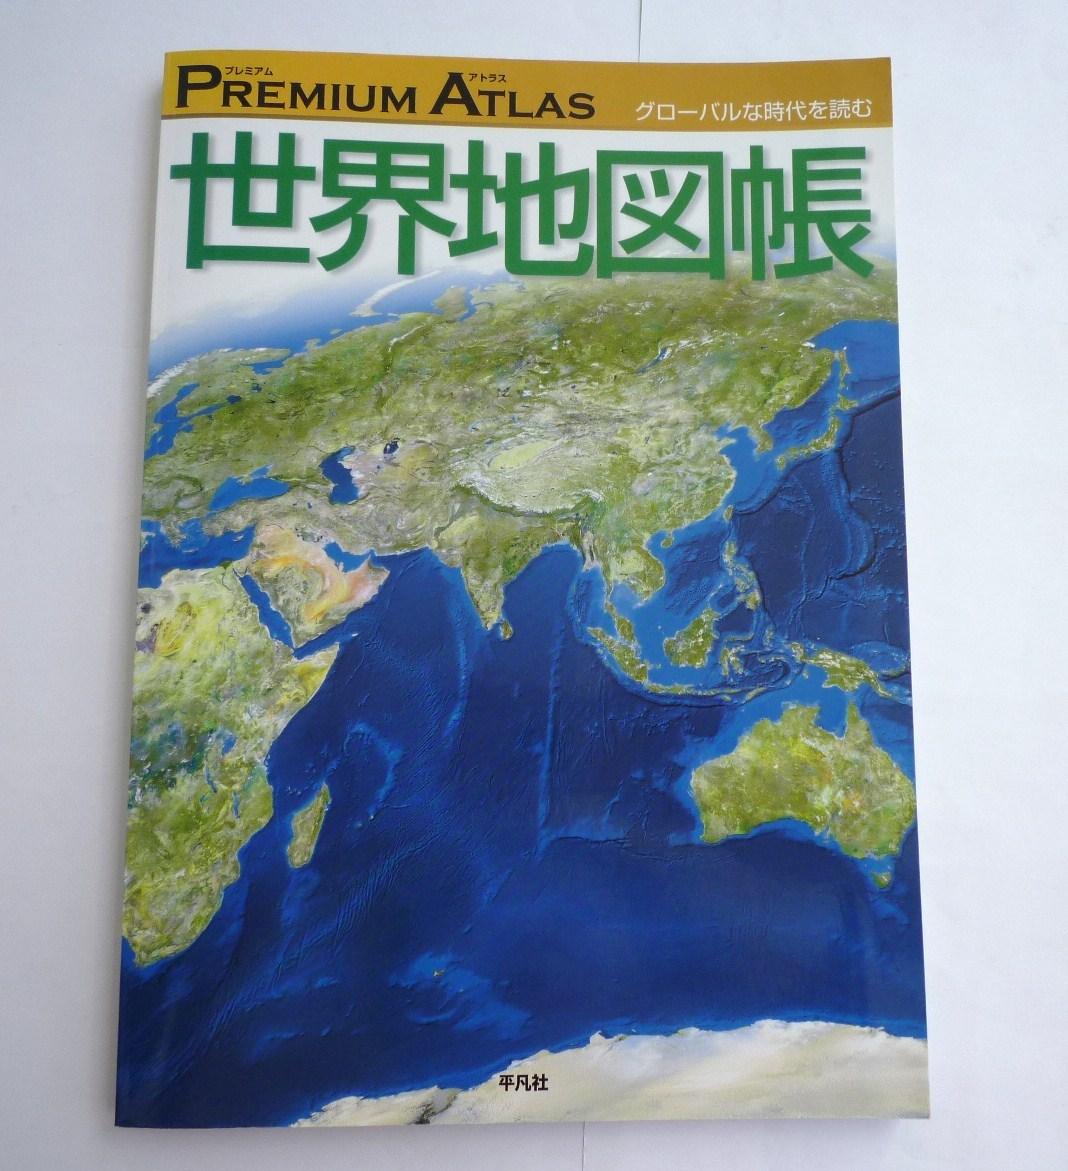 Yahoo World Map on hp world map, linkedin world map, bank of america world map, fox news world map, craigslist world map, blog world map, country finder world map, ashley madison world map, ask world map, mail world map, cbs world map, iphone world map, skype world map, tcs world map, viewable world map, newspaper world map, email world map, airbnb world map, att world map,